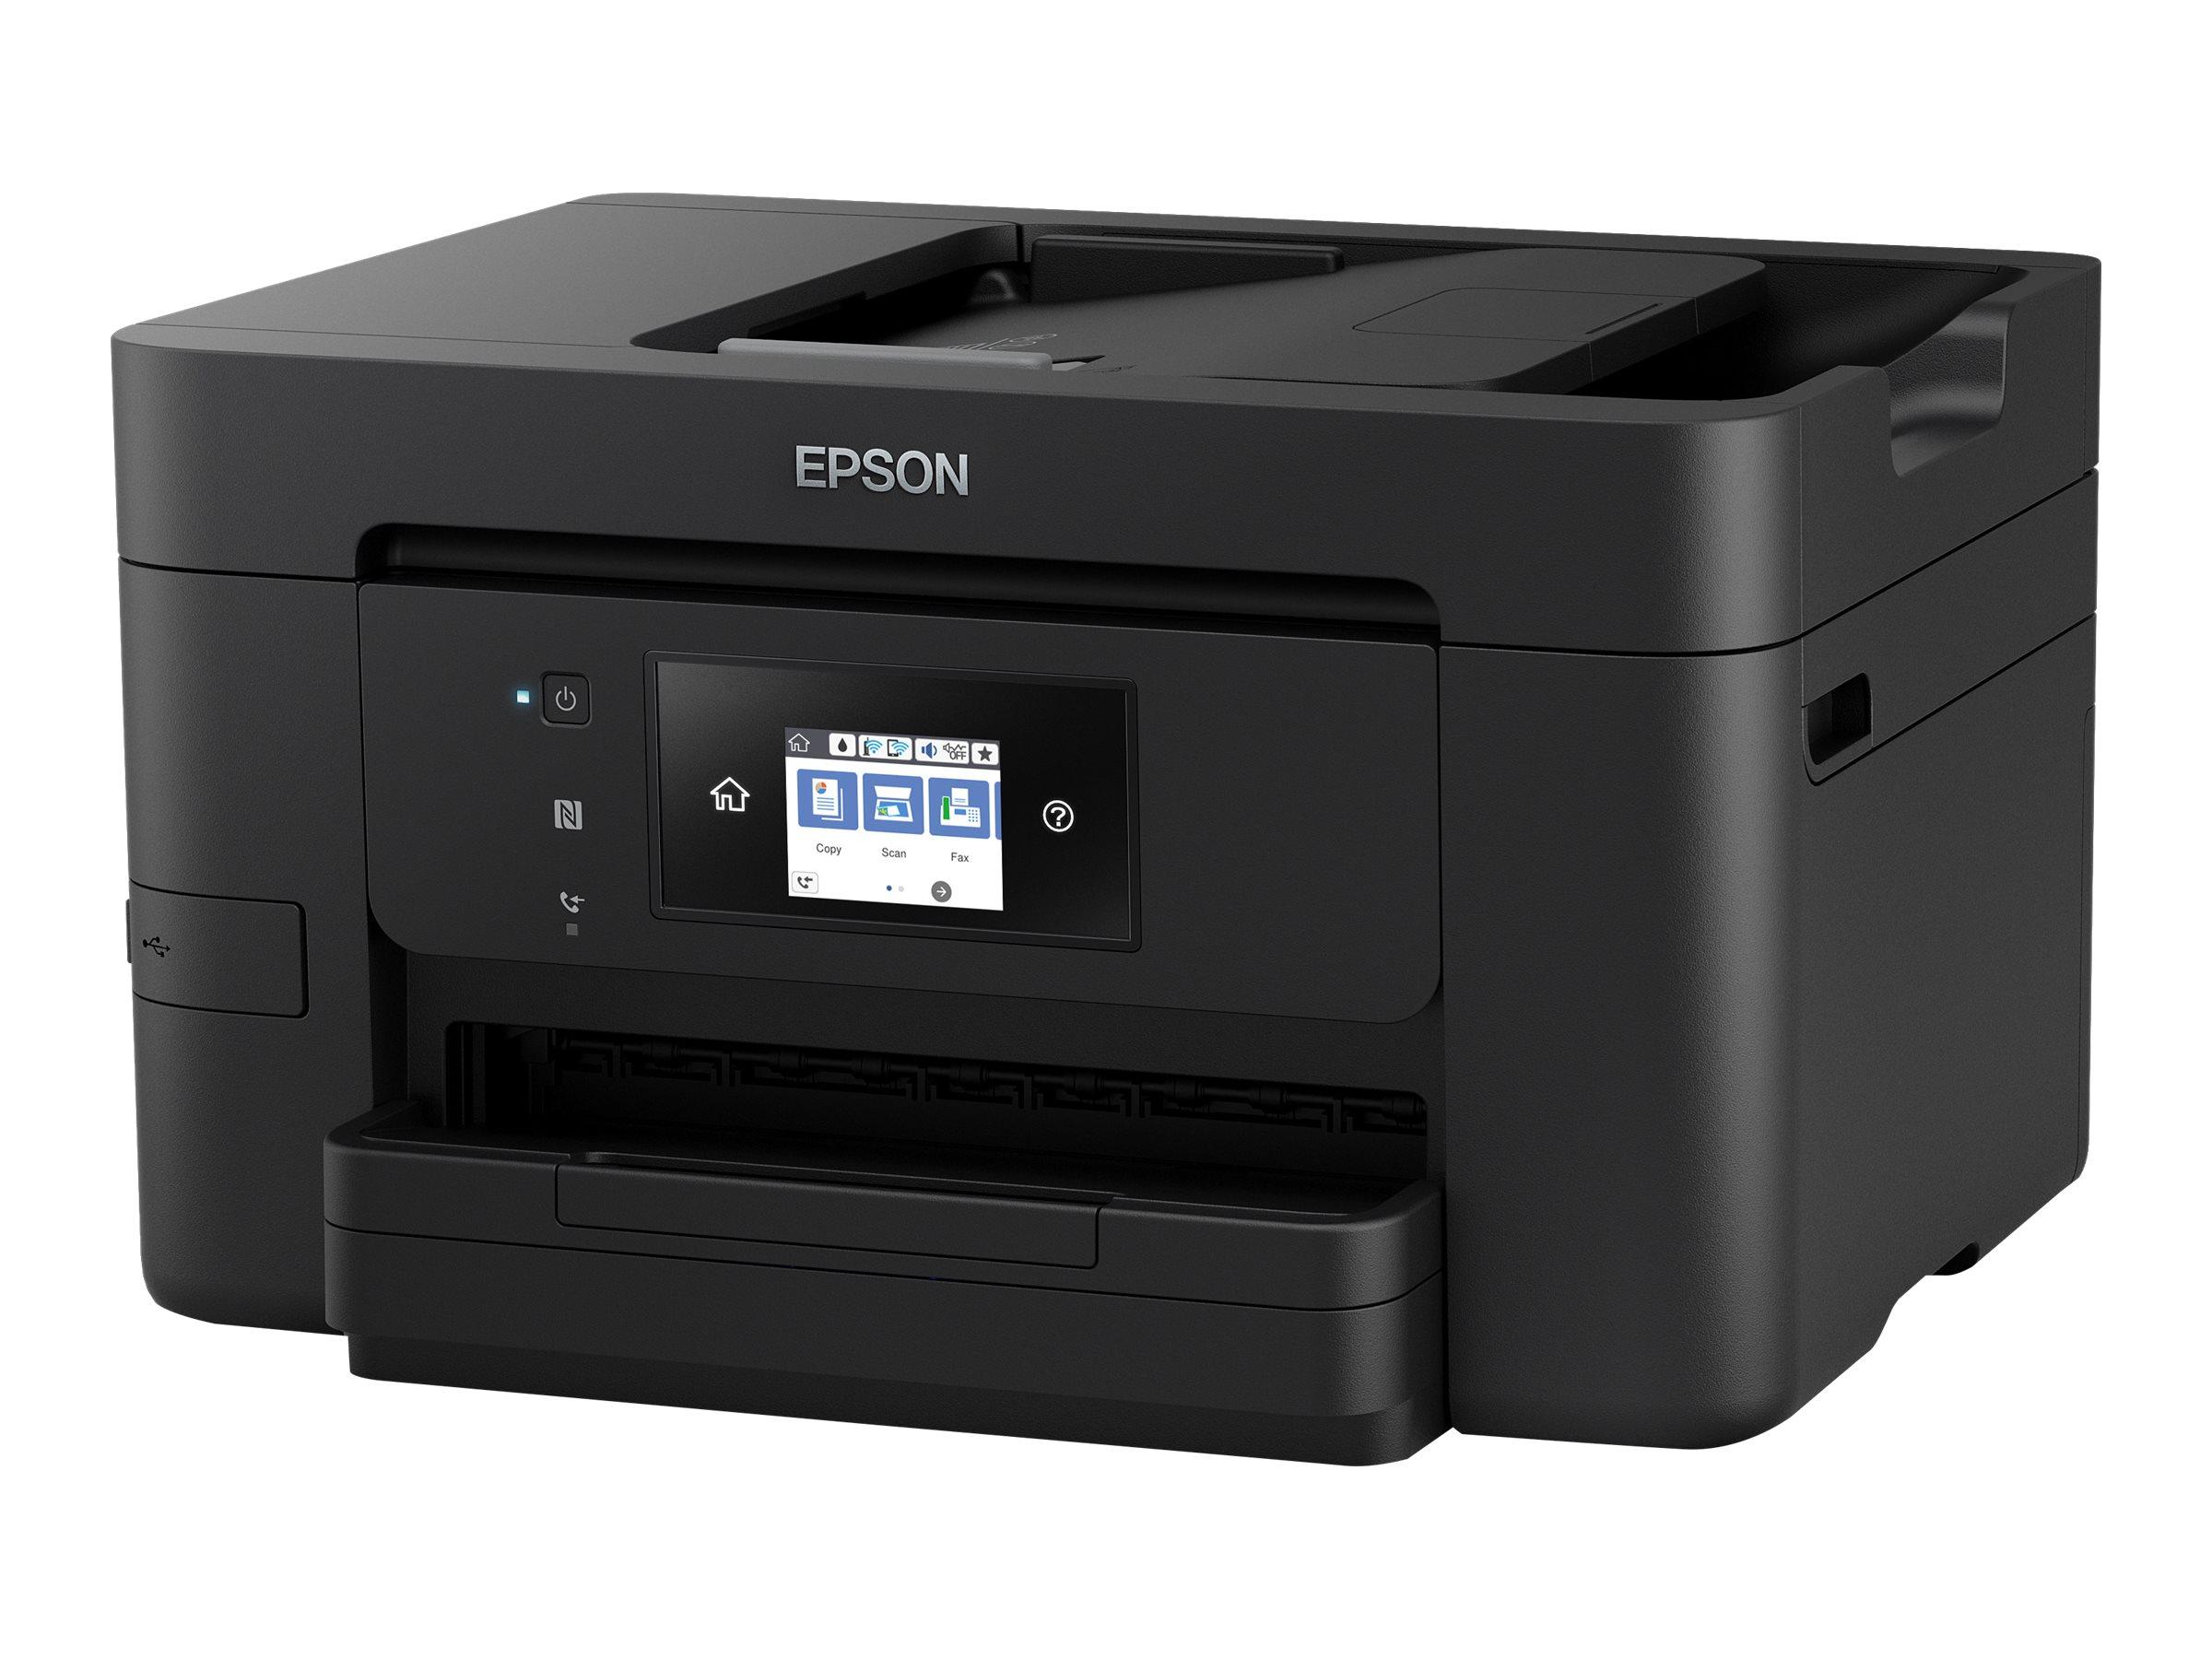 Epson WorkForce Pro WF-3725DWF - Multifunktionsdrucker - Farbe - Tintenstrahl - A4/Legal (Medien)